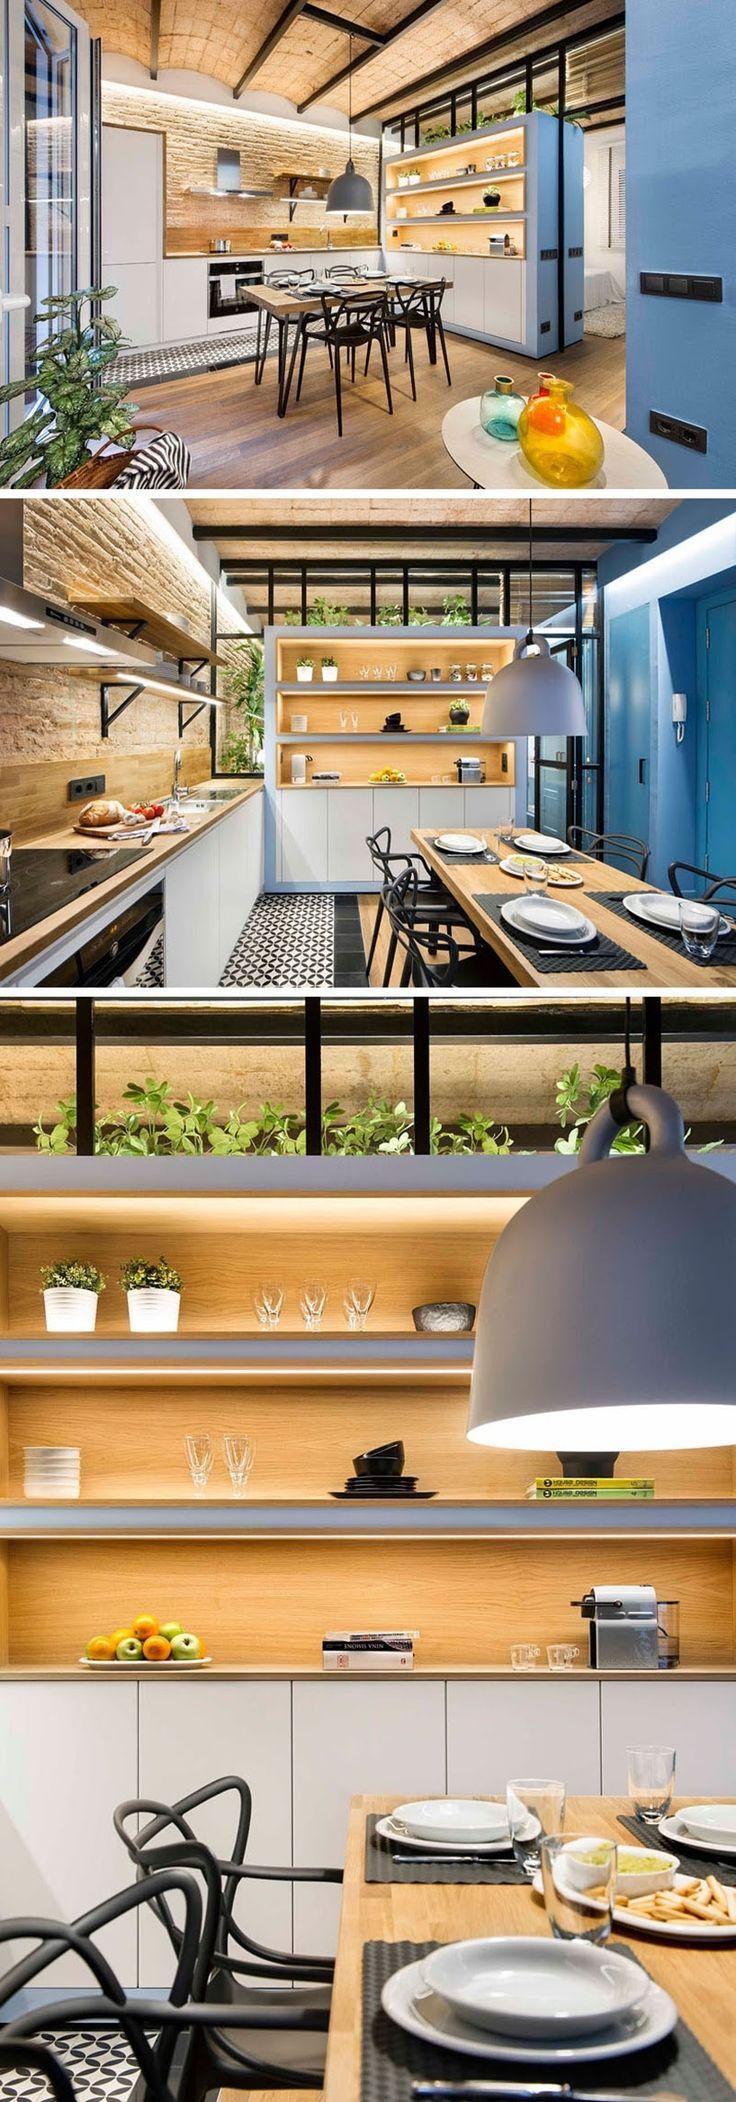 17 mejores ideas sobre peque o estudio en pinterest for Practicas estudio arquitectura